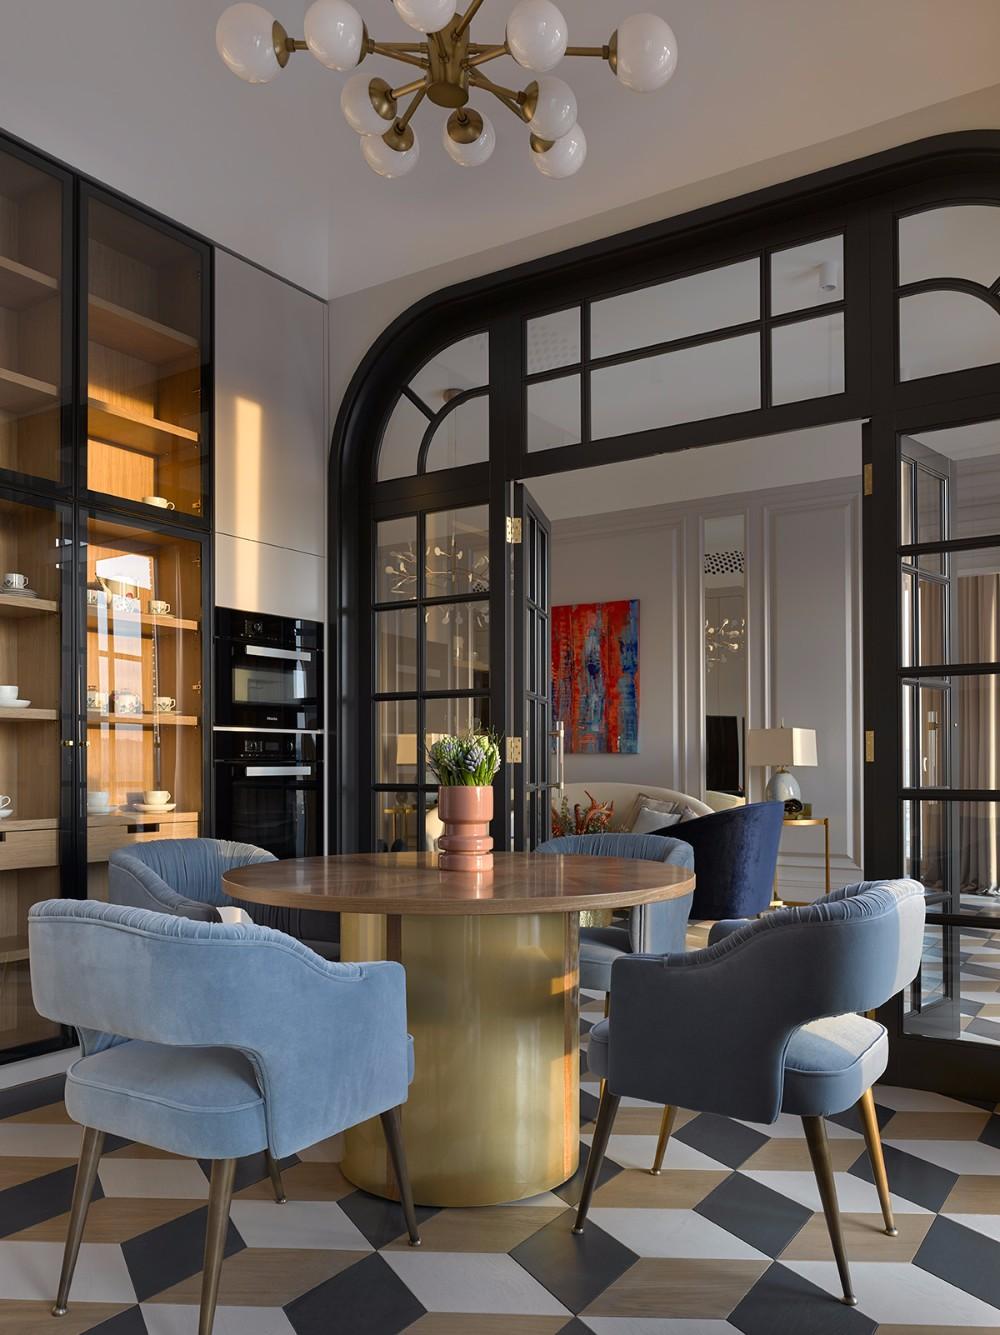 design project design project Design Project: Modern Apartment by Ekaterina Lashmanova Efr7250